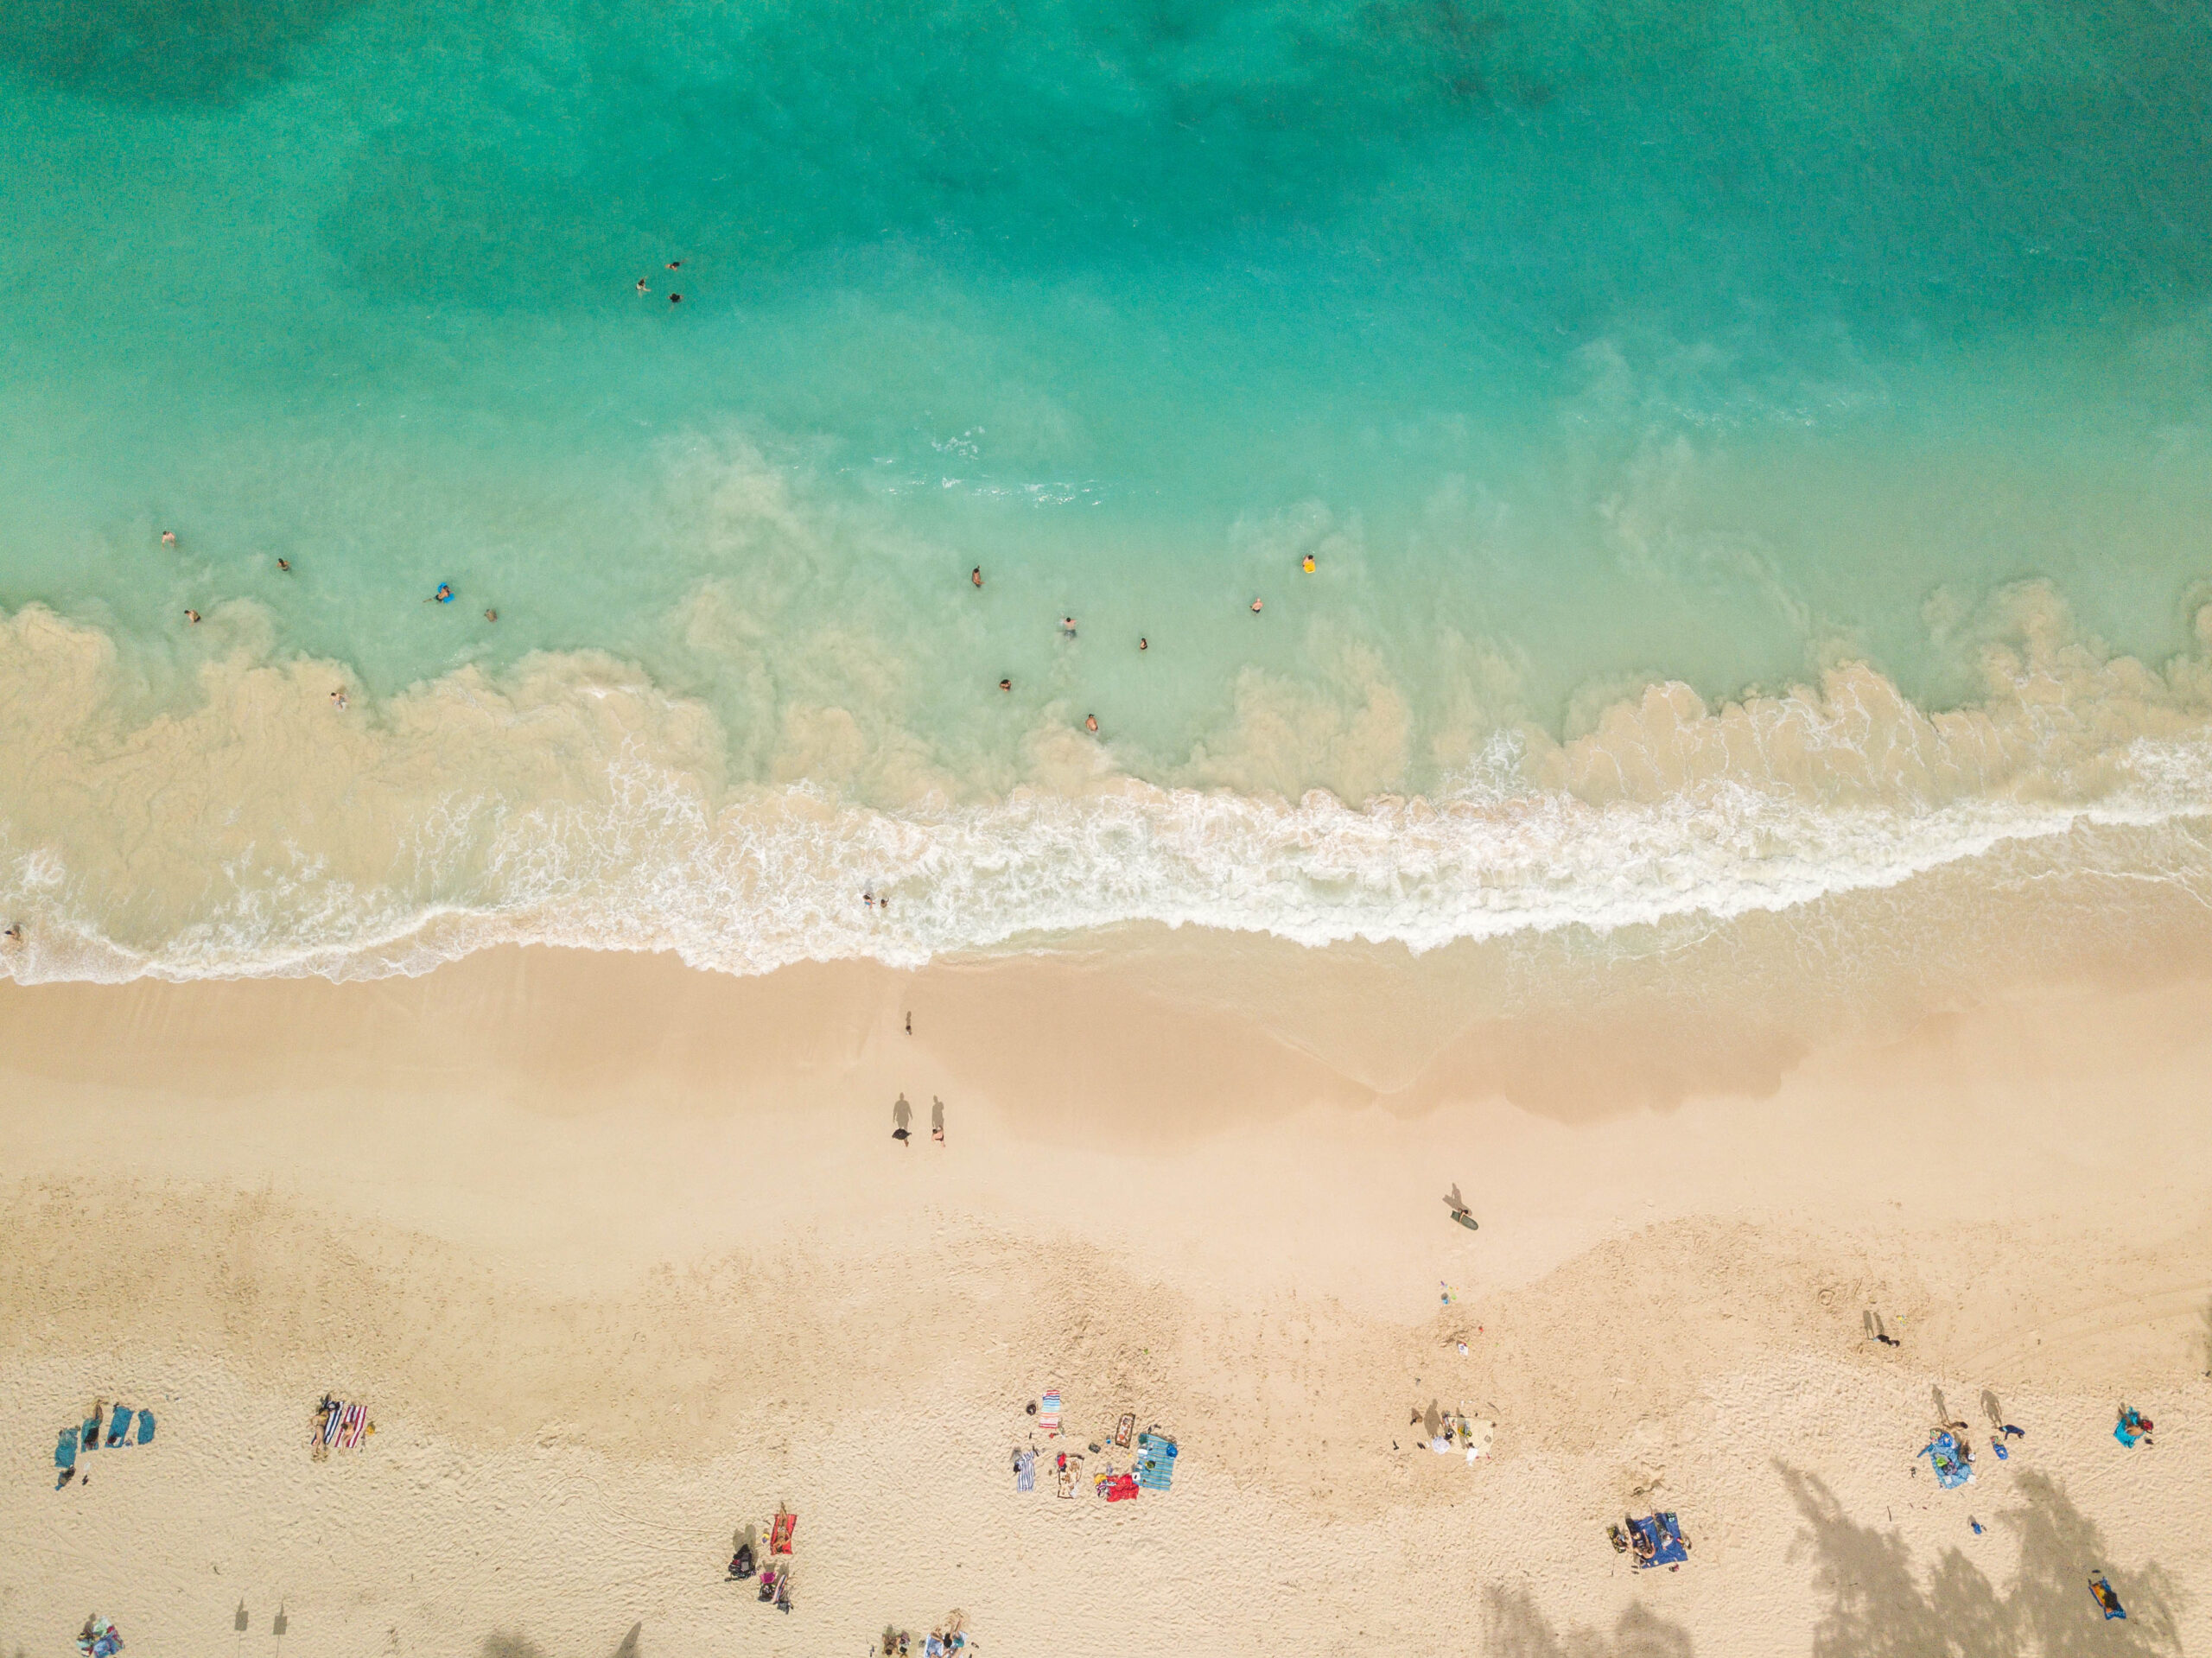 Aerial beach photograph of Waimanalo Beach - White sand with turquoise ocean